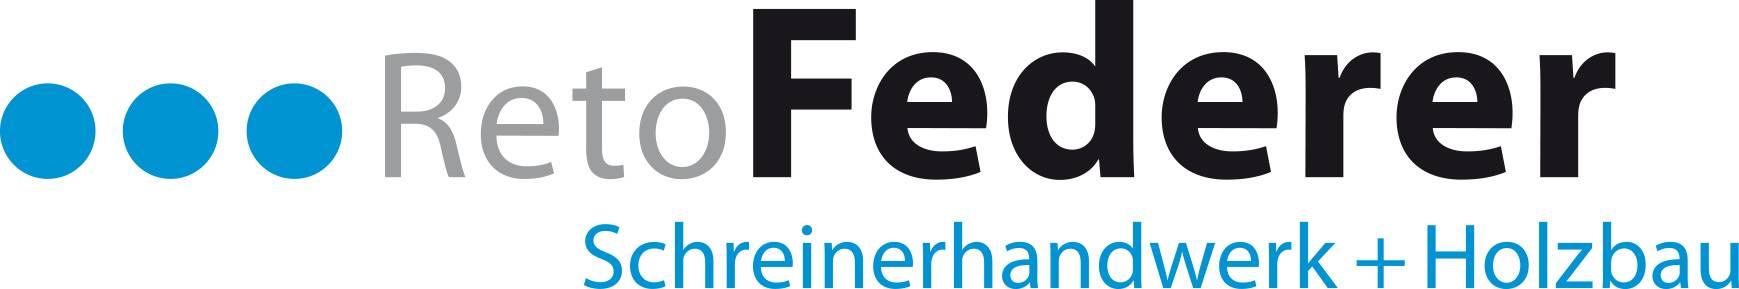 Reto Federer GmbH